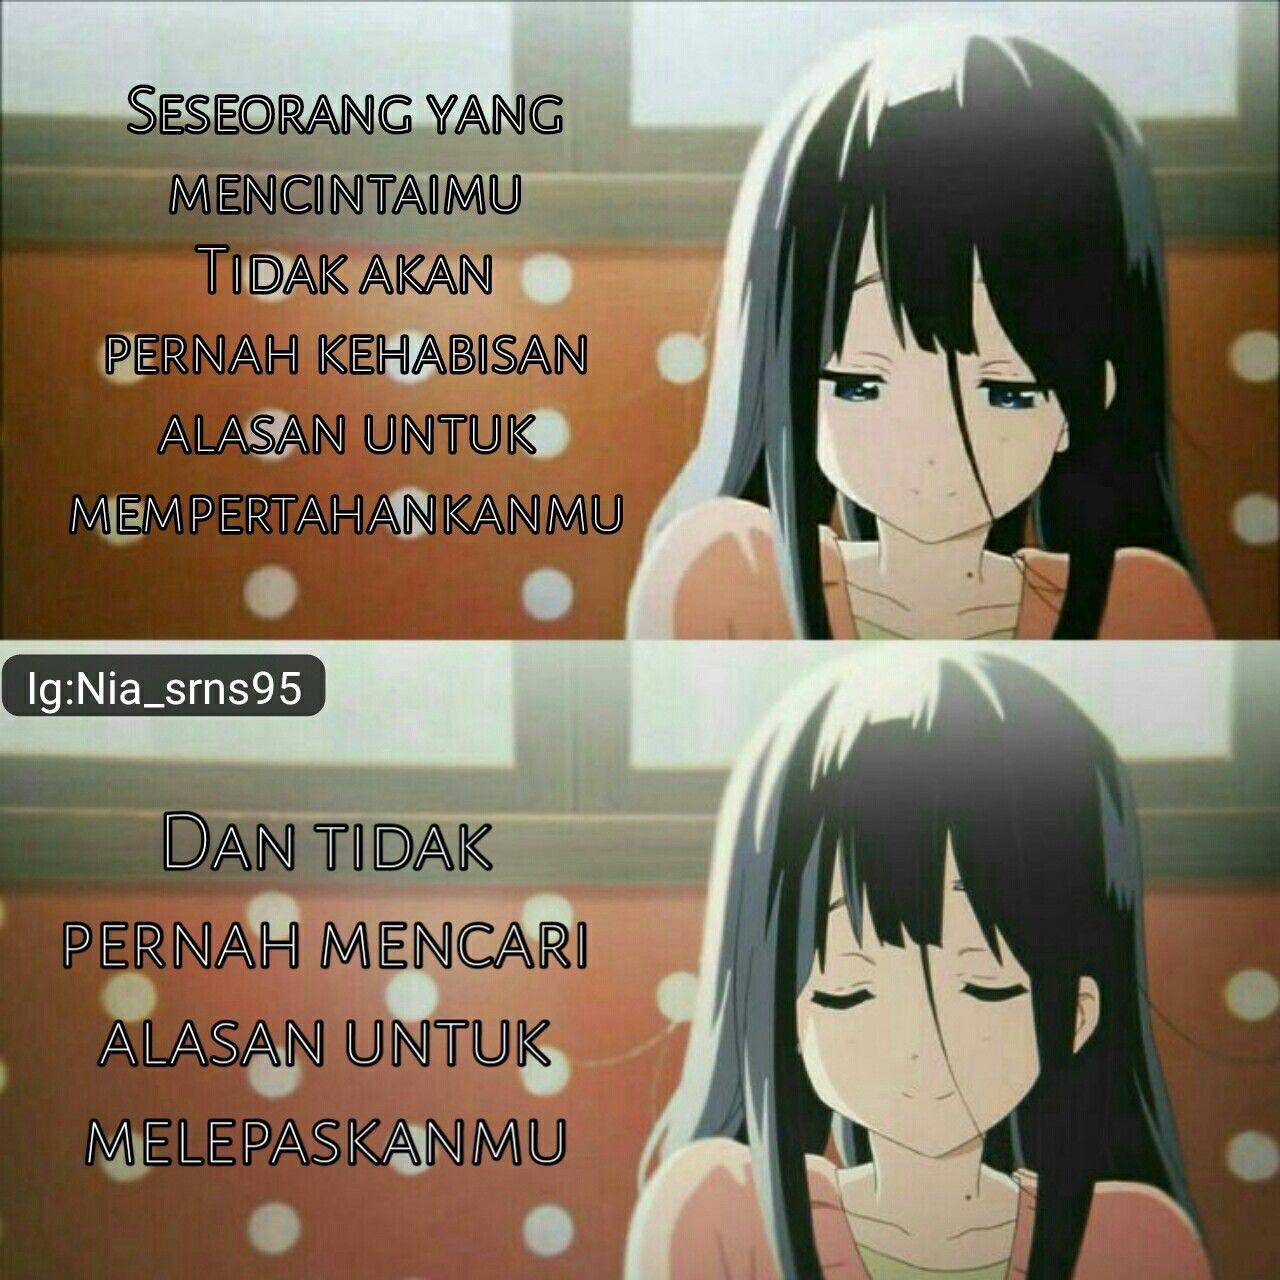 Pin oleh {S} Nana di Anime Quotes Katakata indah